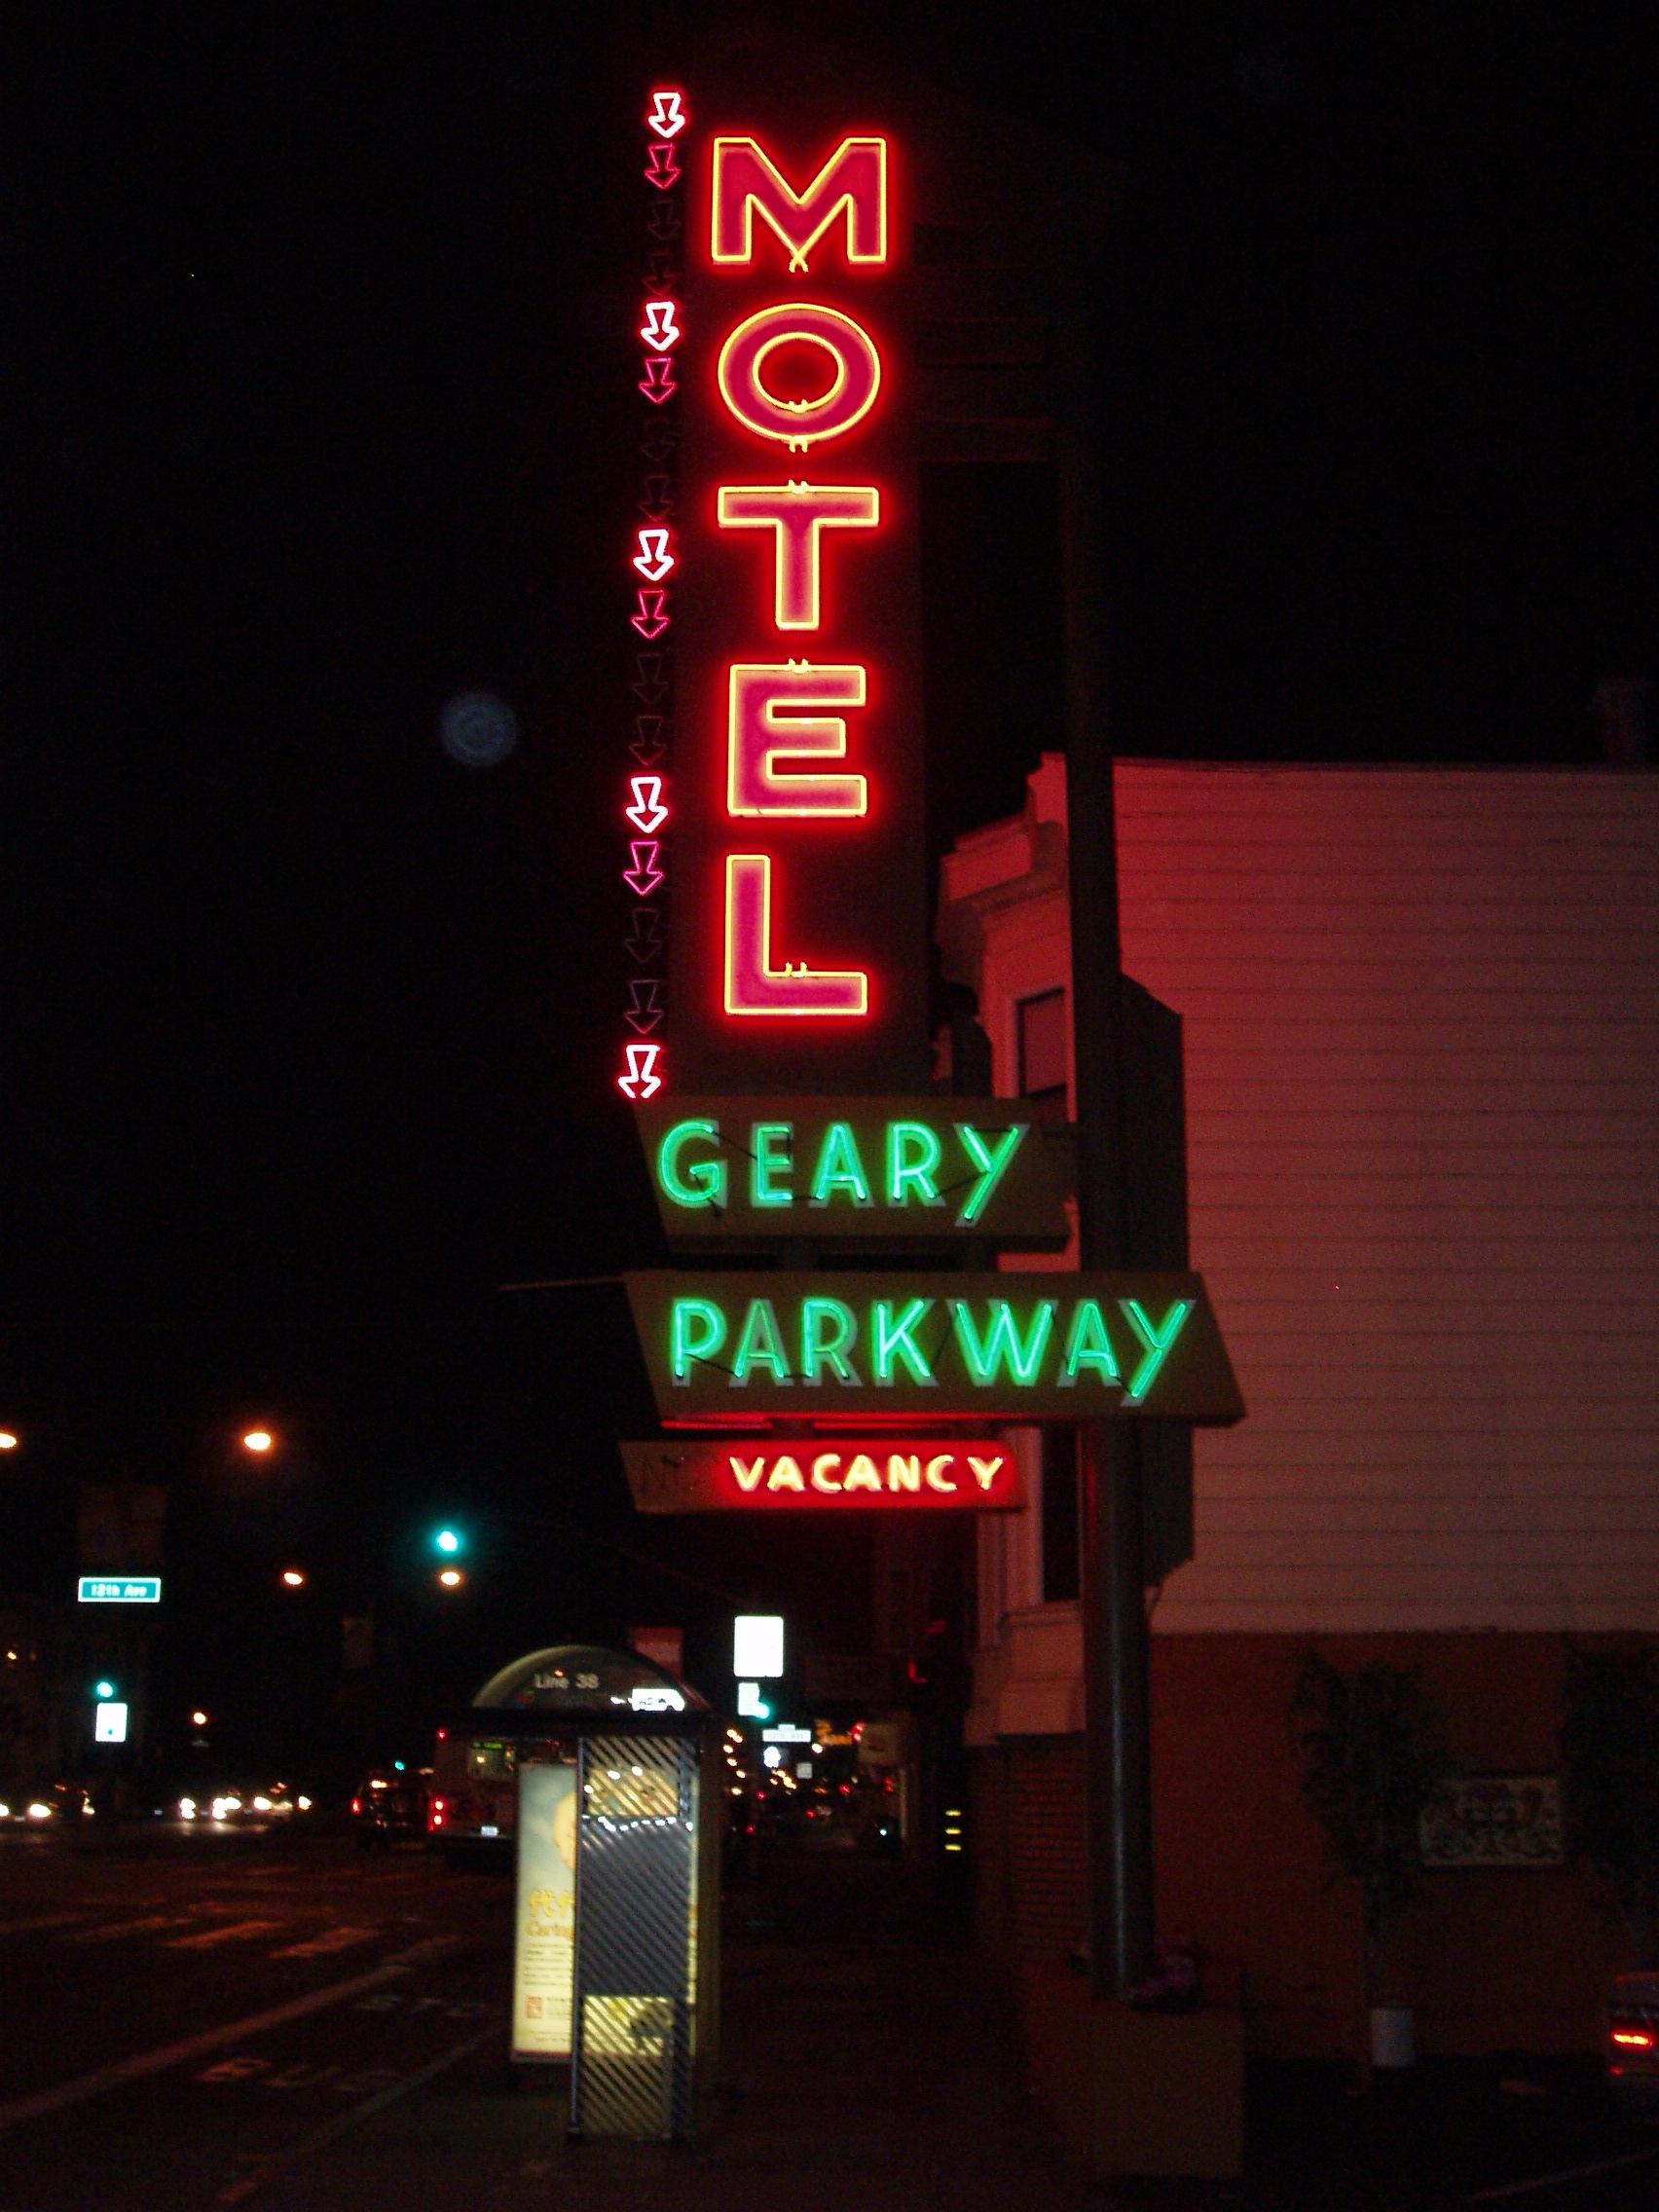 Geary Parkway Motel - 4750 Geary Boulevard, San Francisco, California U.S.A. - November 29, 2007